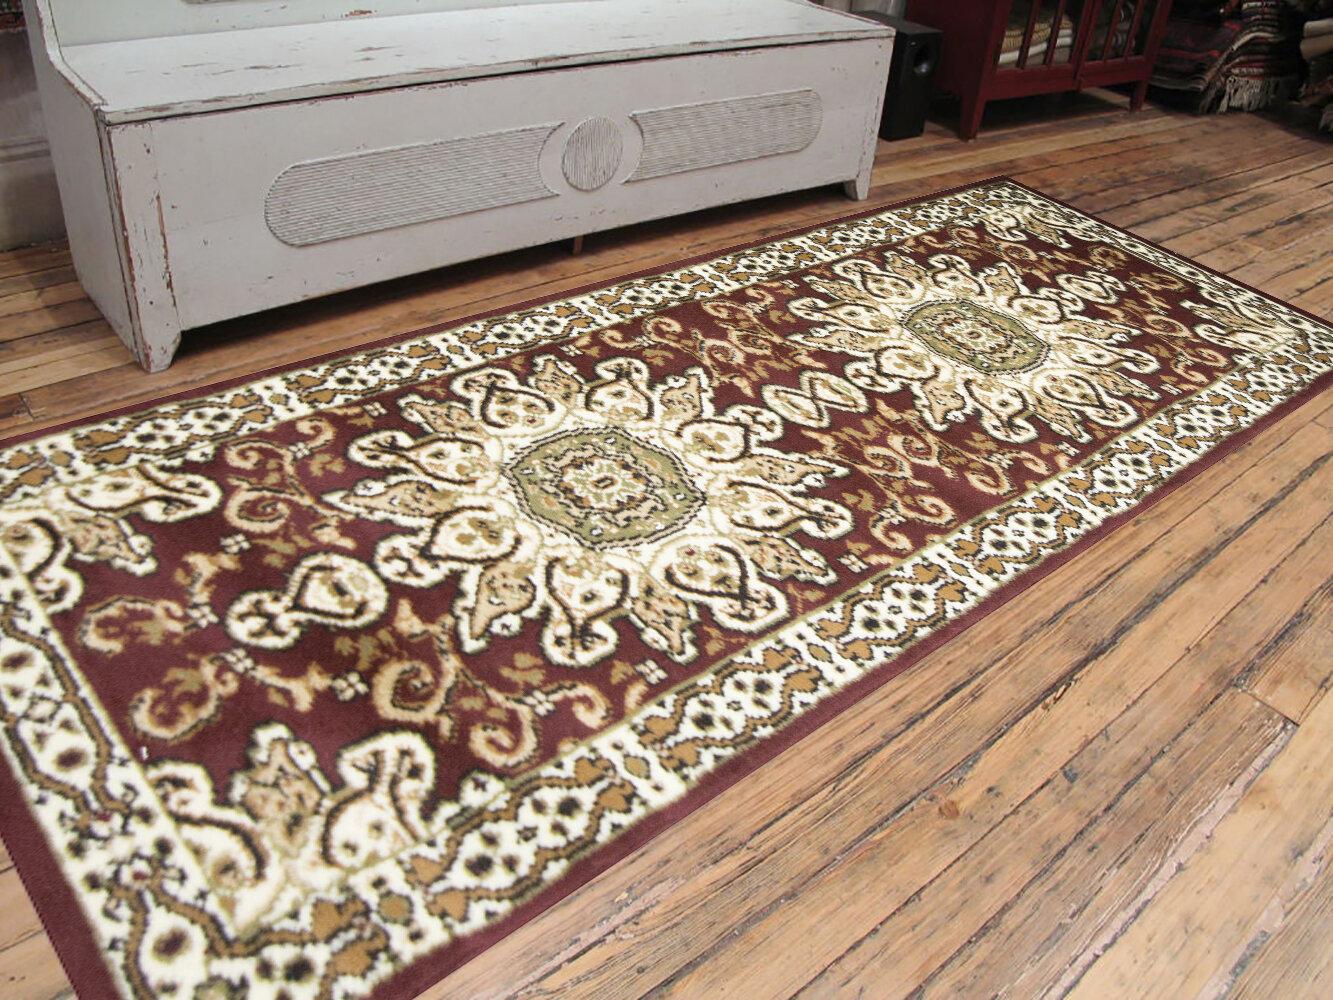 Dog Themed Doormat Area Rugs You Ll Love In 2021 Wayfair